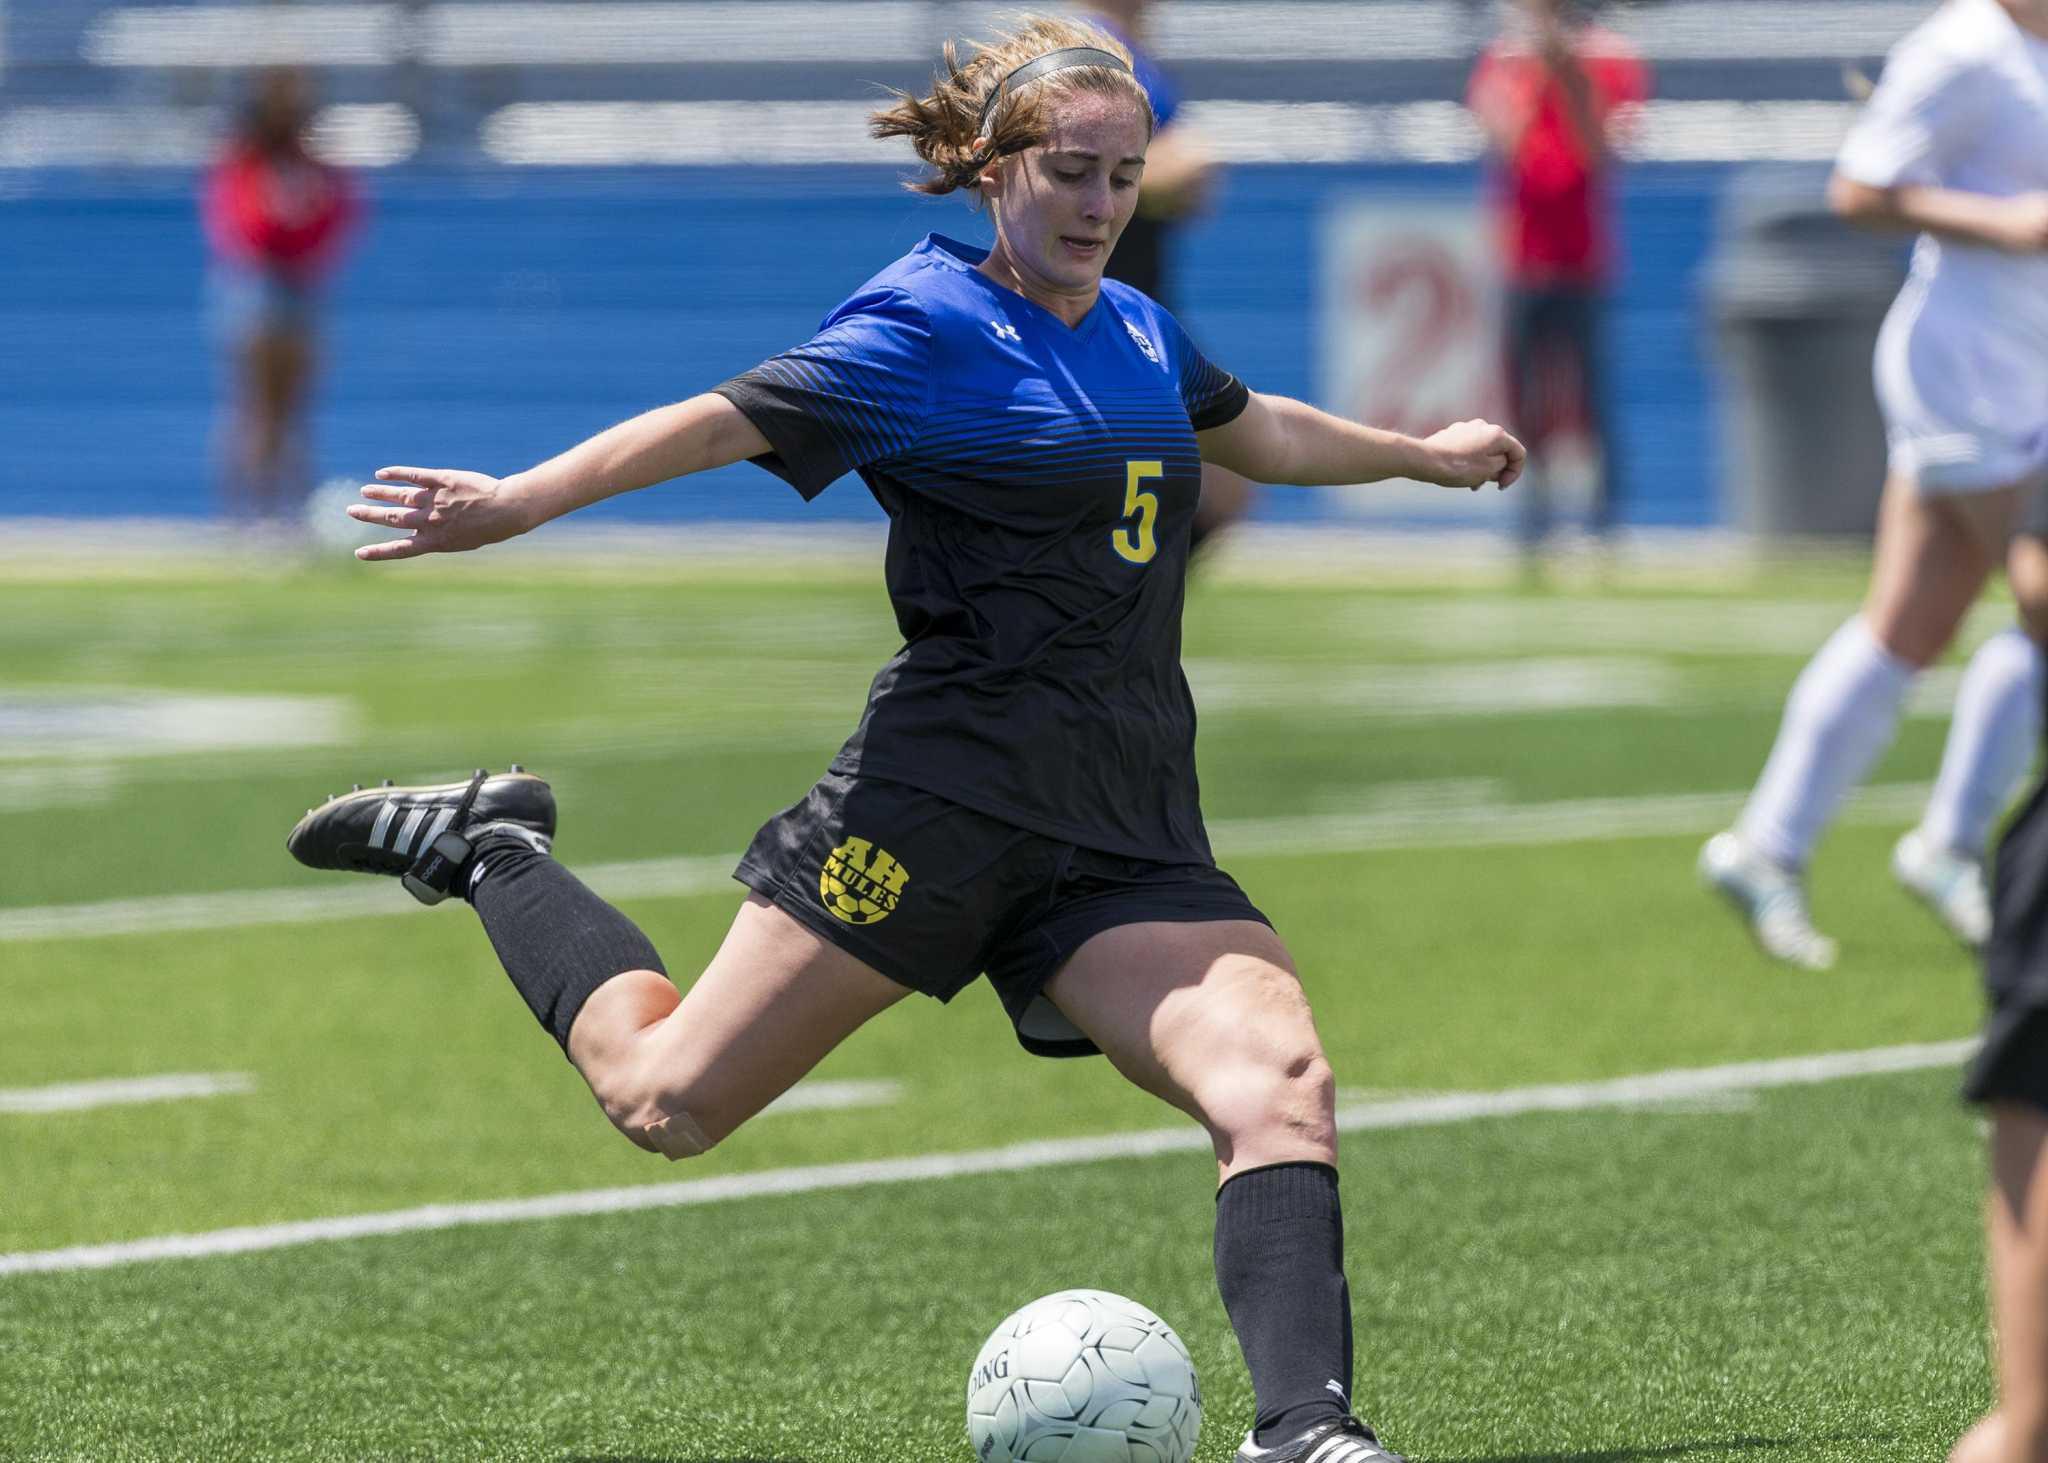 Girls soccer: Saturday's high school results - San Antonio